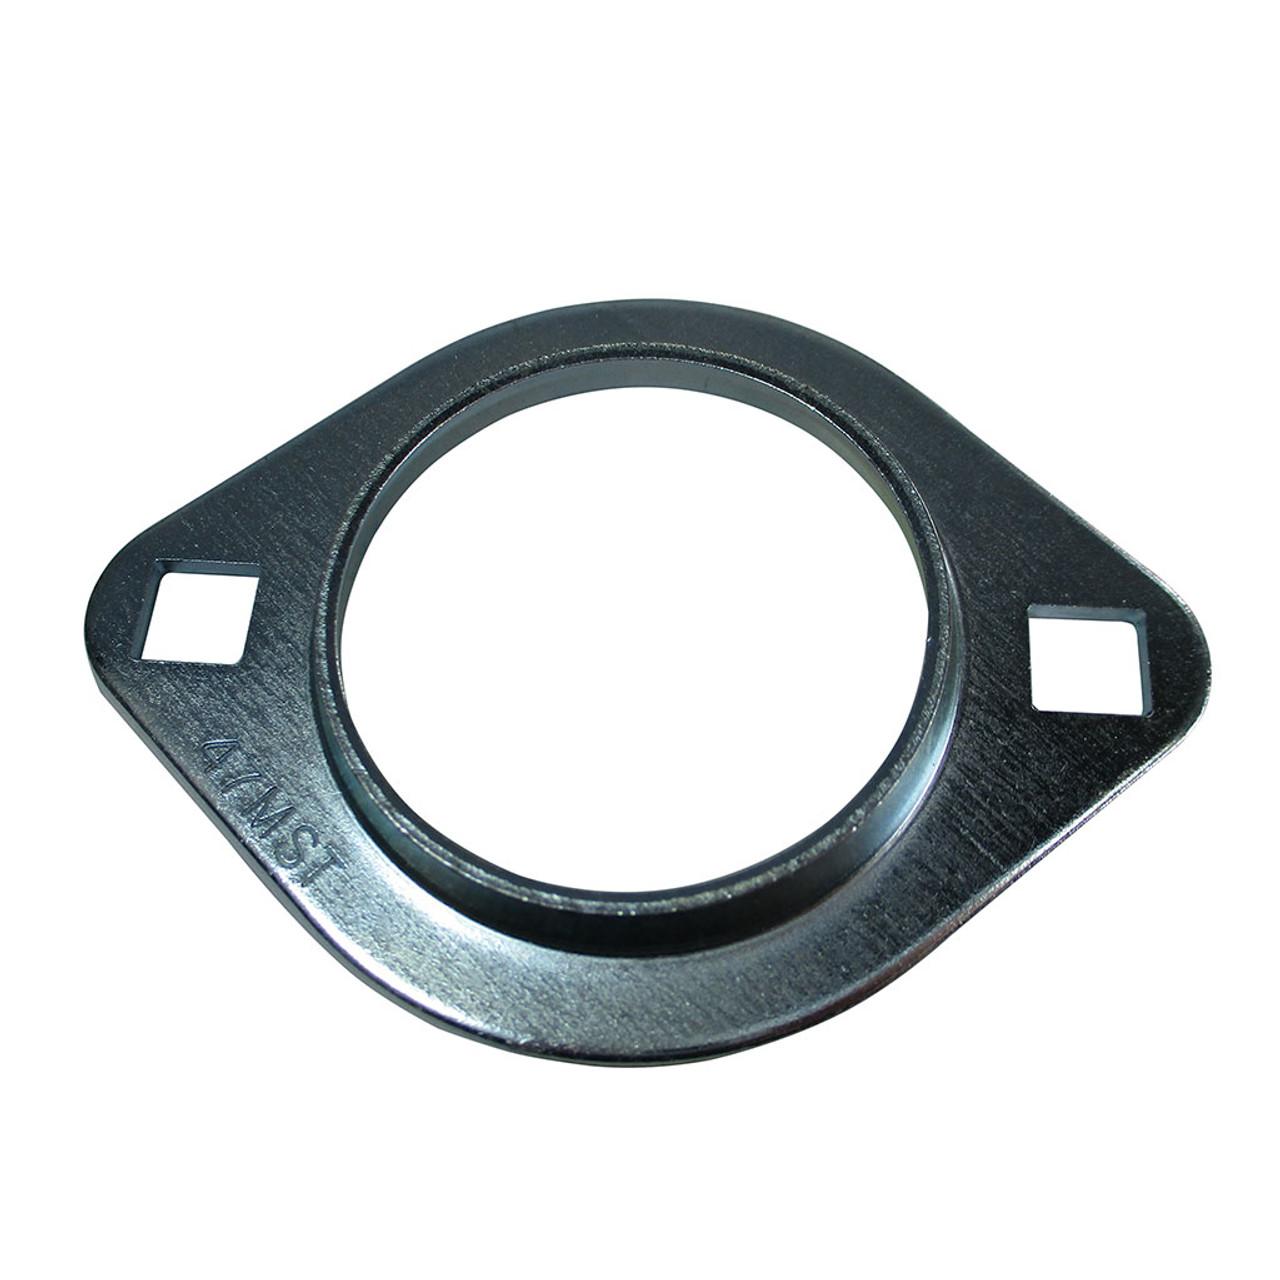 "3/4"" Axle Bearing Flangette, 2-Hole"